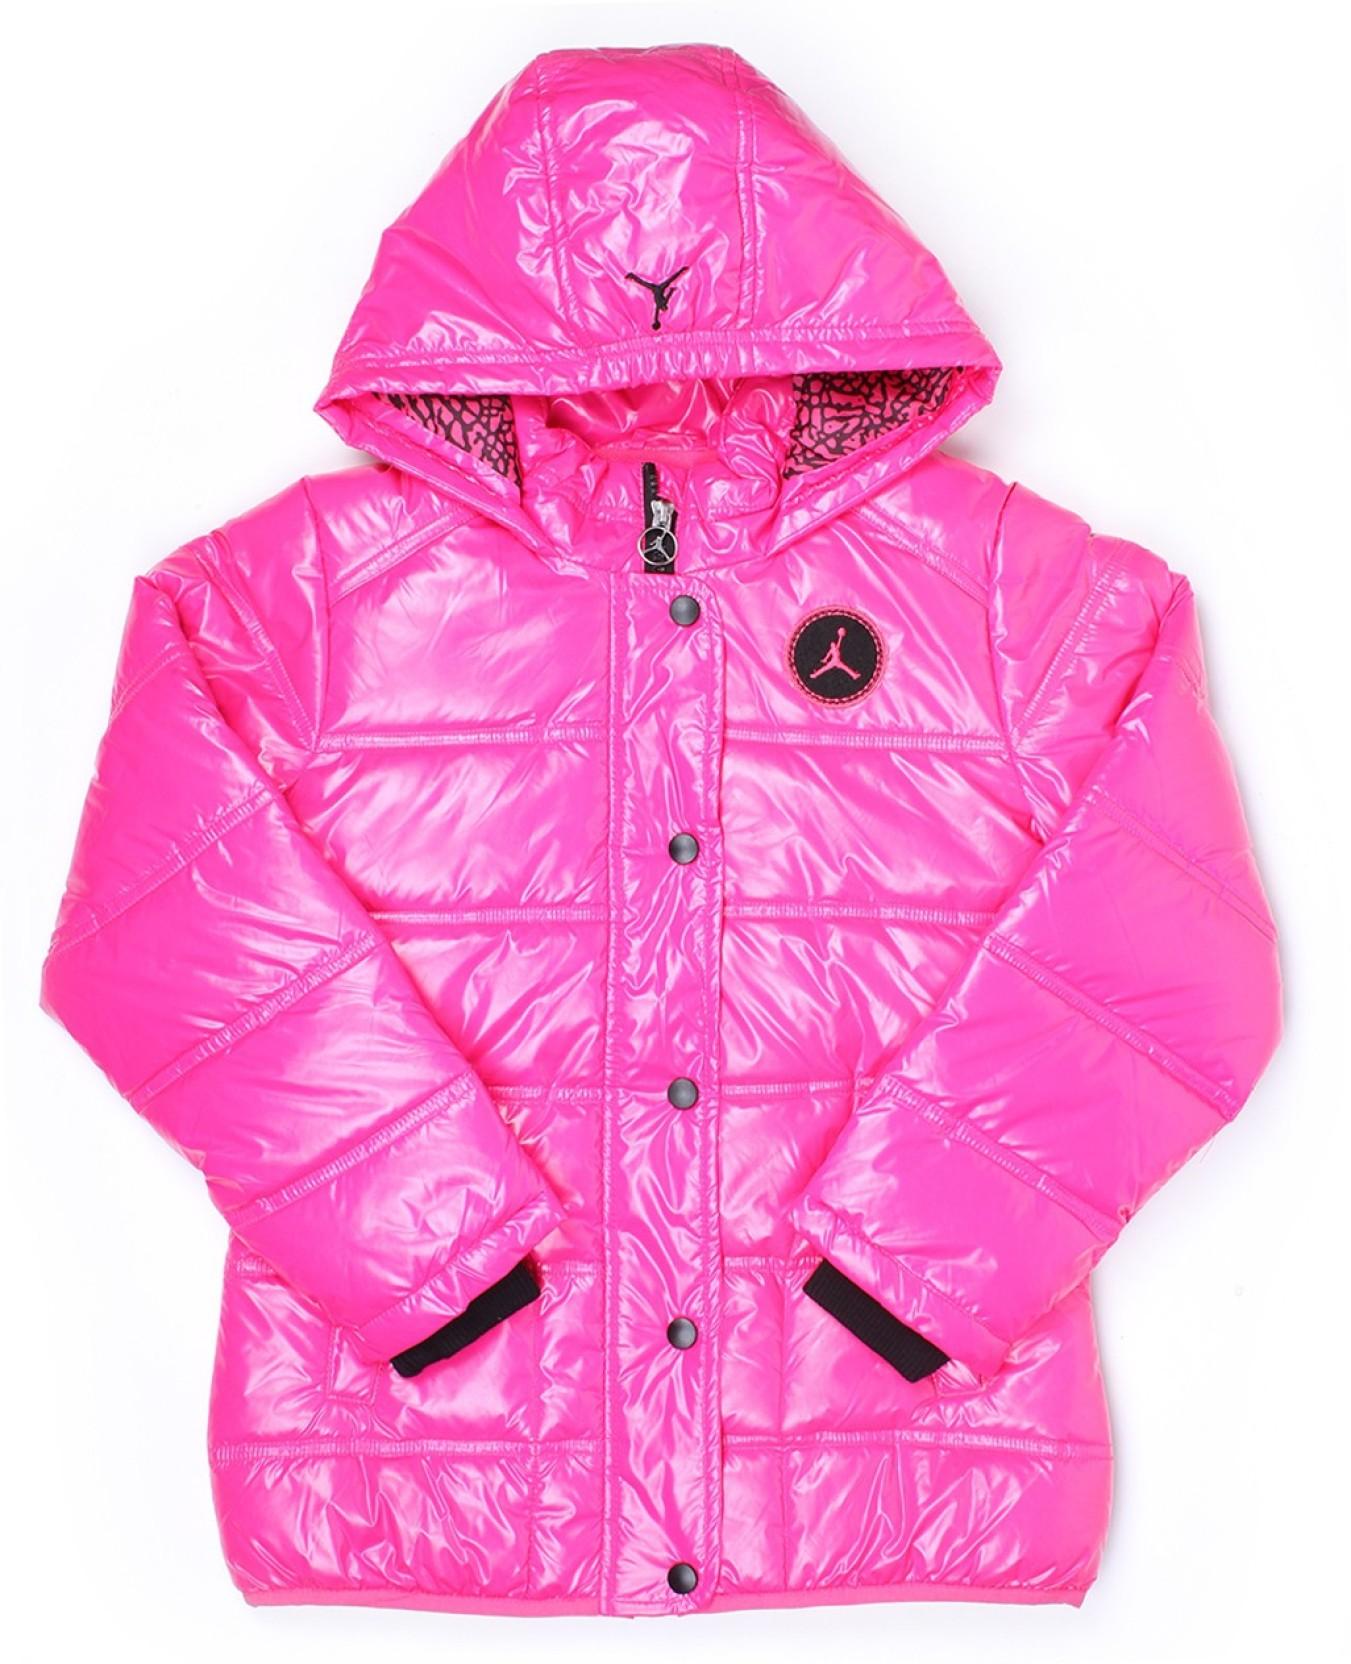 0201b1b0e1854 Jordan Kids Girls Nylon Sweater Top Price in India - Buy Jordan Kids ...